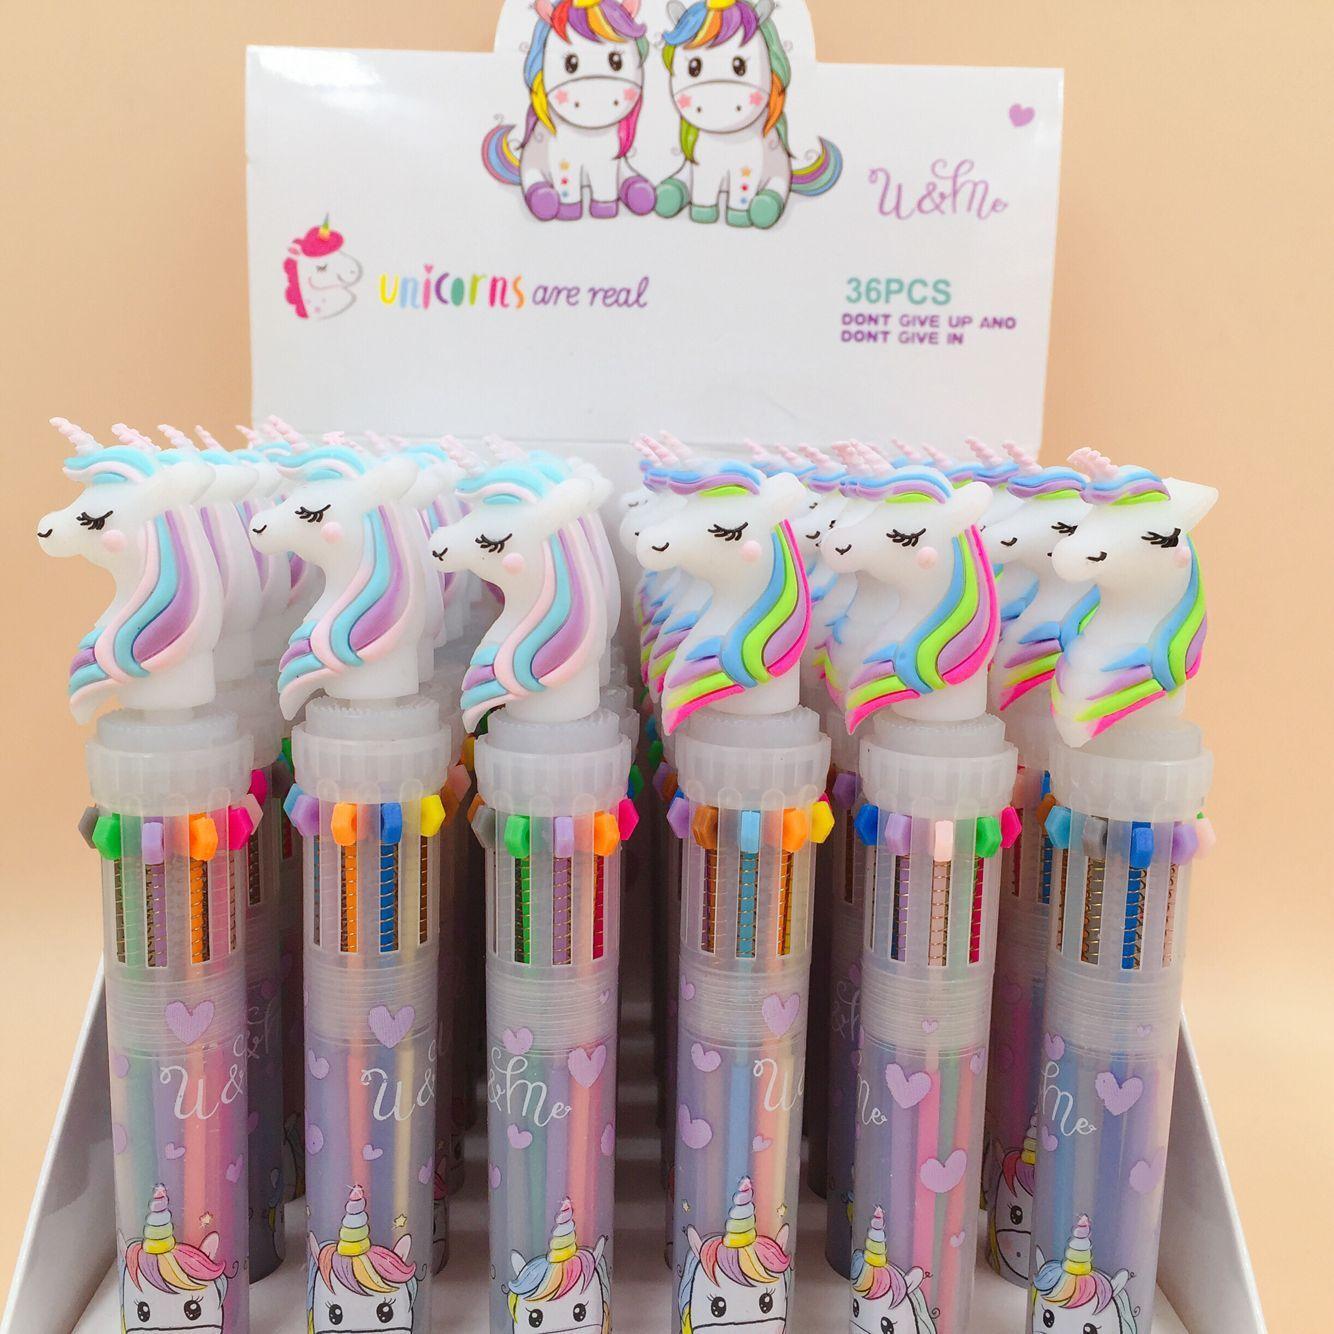 Precioso unicornio potencia 10 colores bolígrafo grueso escuela Oficina regalo papelería Escolar